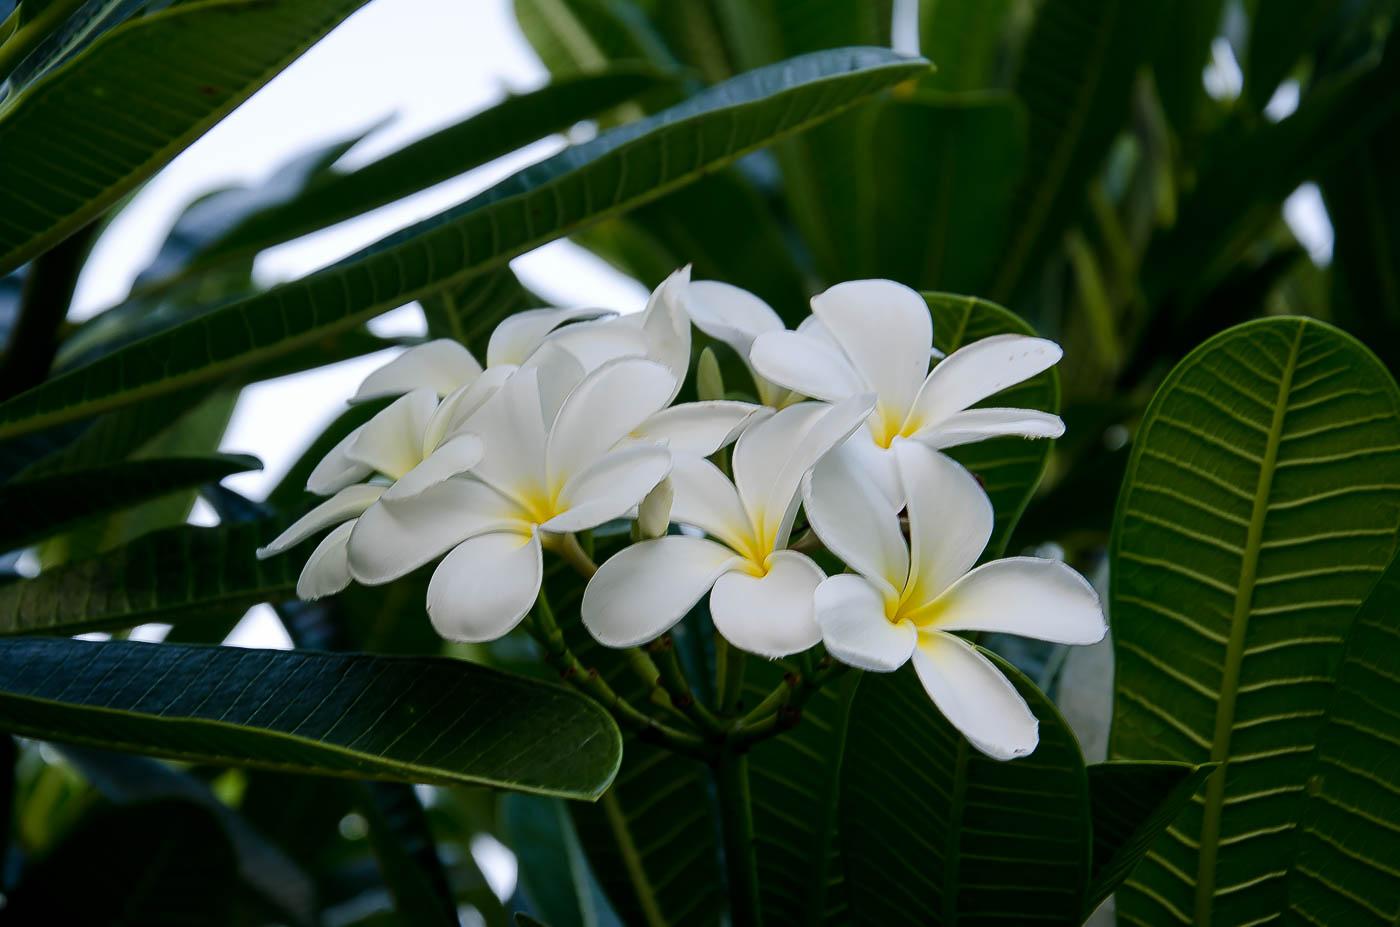 Plumeria at Kuleana, Maui, HI | Pono Images